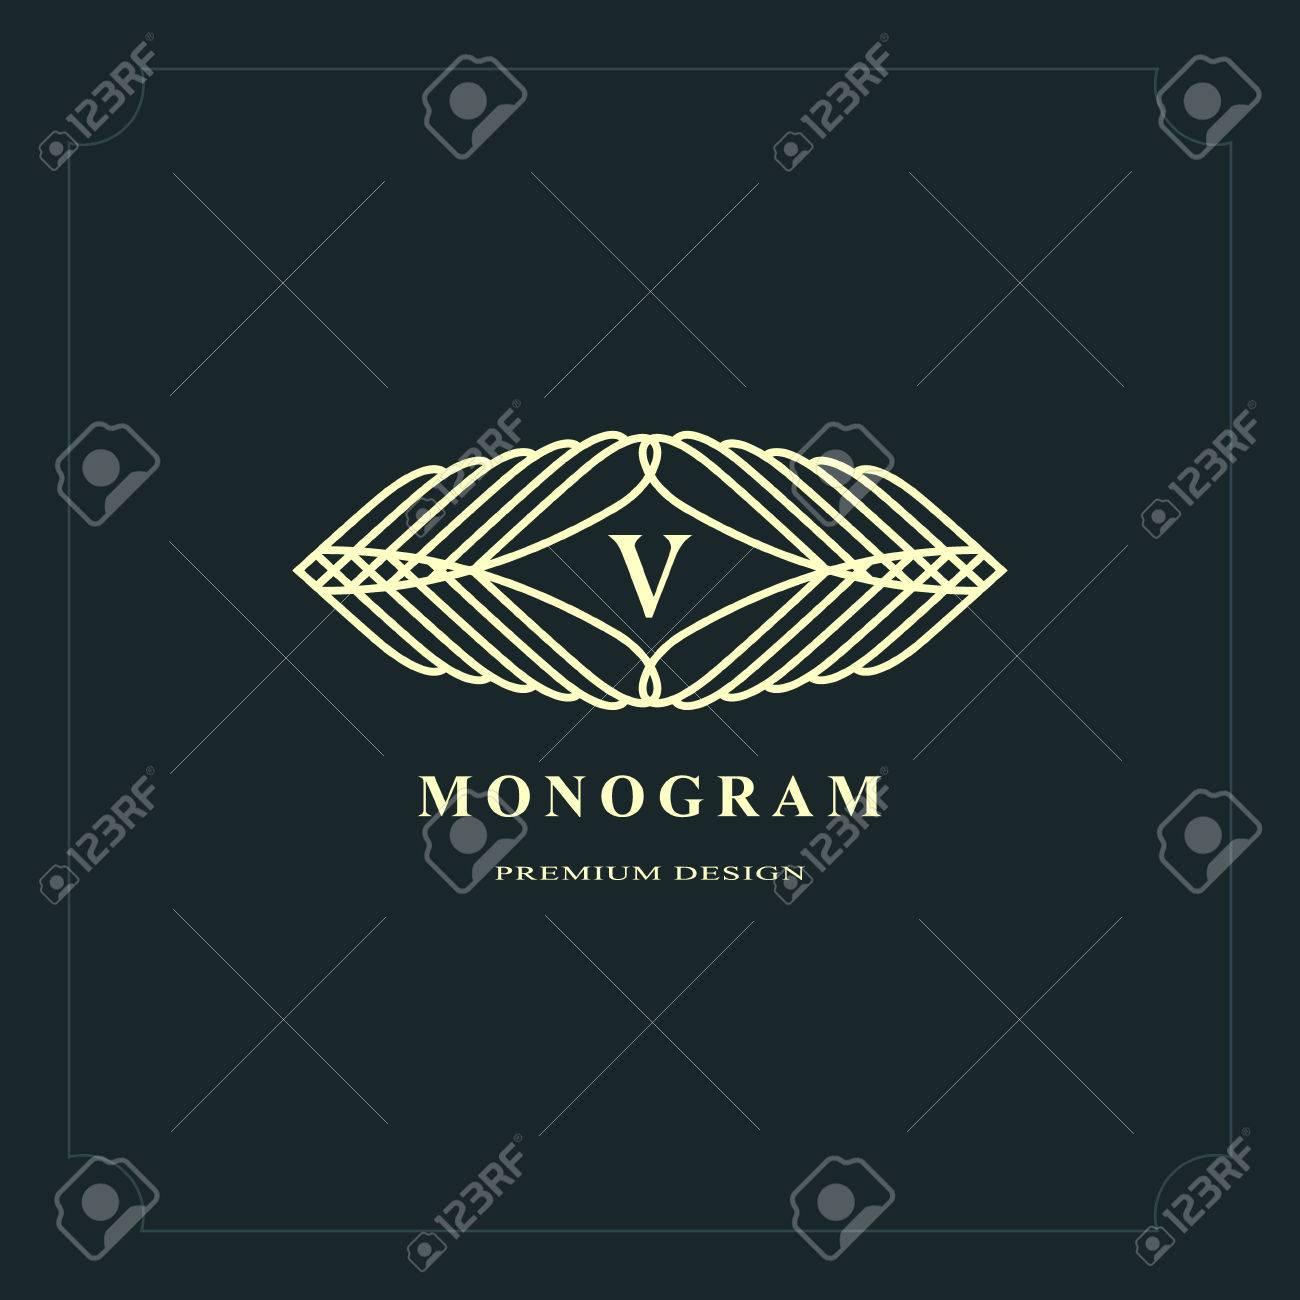 Line graphics monogram elegant art logo design letter v graceful line graphics monogram elegant art logo design letter v graceful template business flashek Choice Image